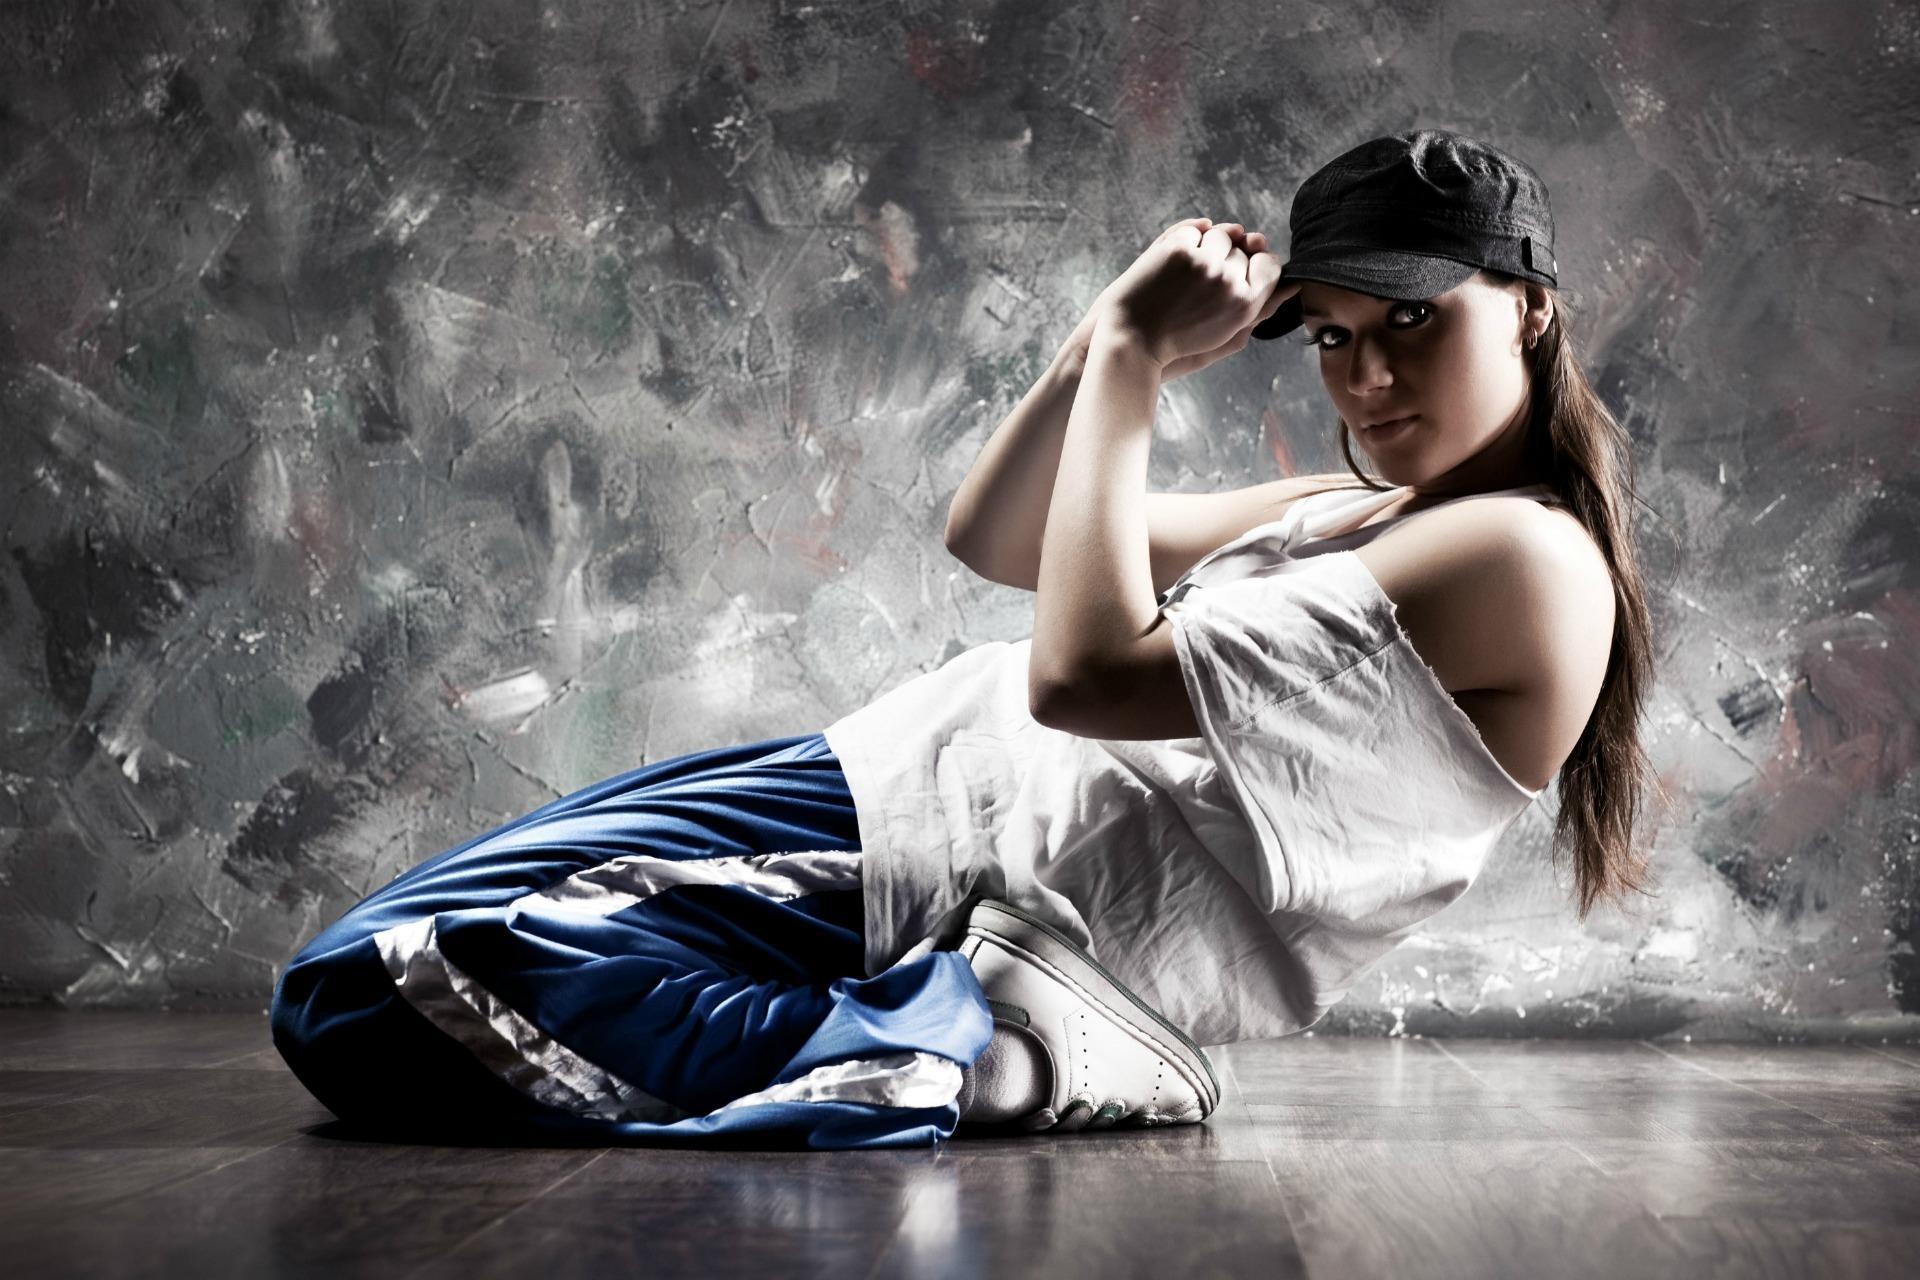 Hip Hop Dance Wallpapers - Wallpaper Cave  Hip Hop Dance W...